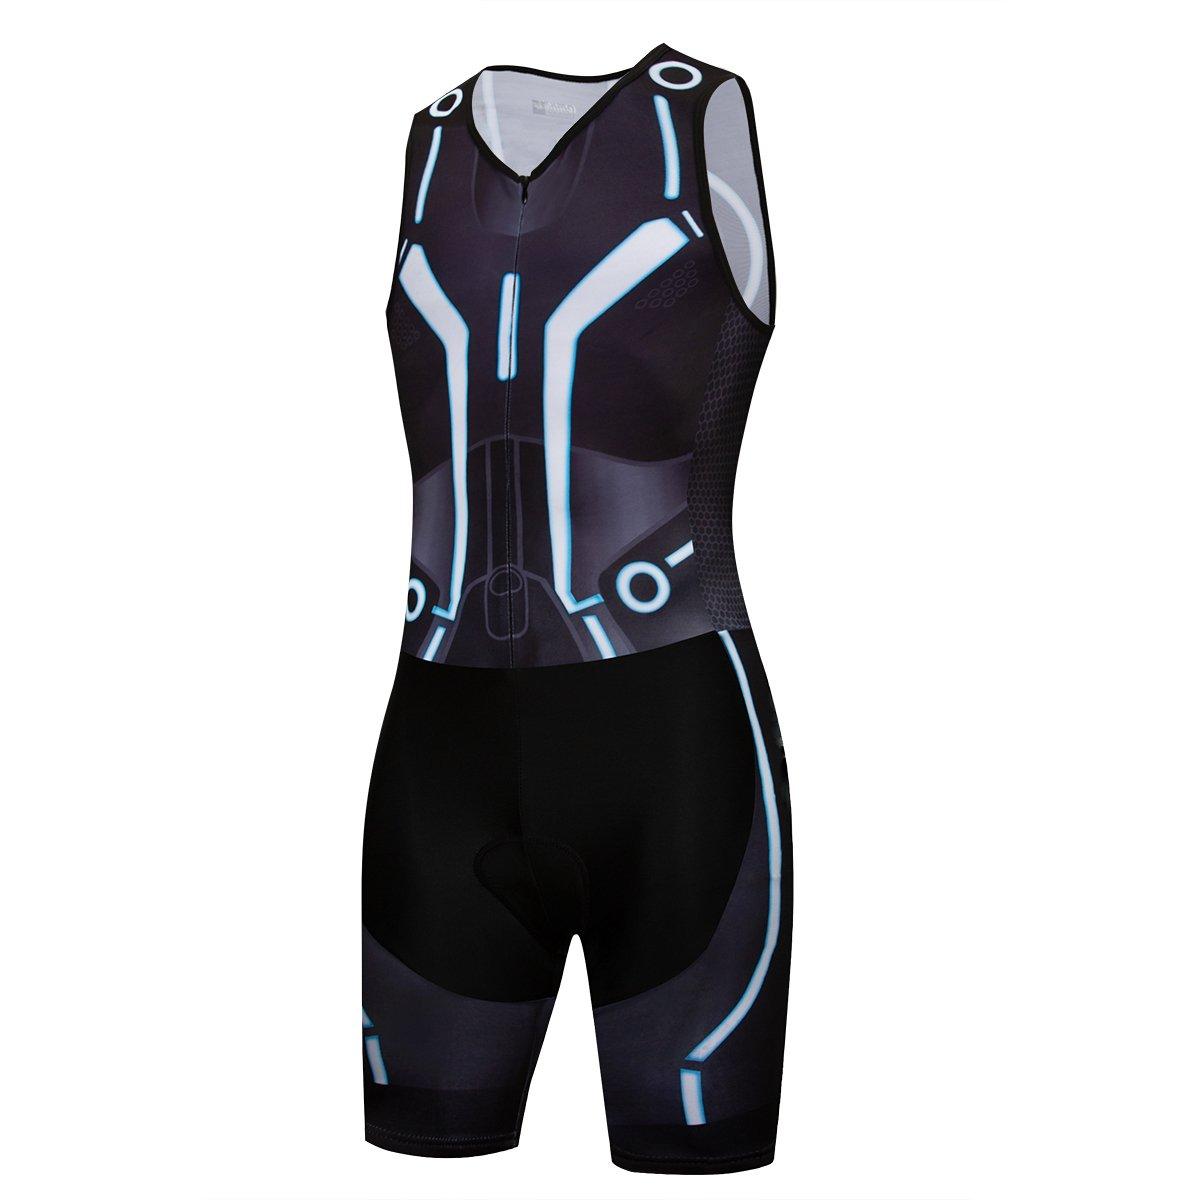 Logas Cool Tron Pro Cycling Jersey Bib Shorts Kit Short Sleeved Trisuit  Triathlon Road Racing Suit 83a39ac06